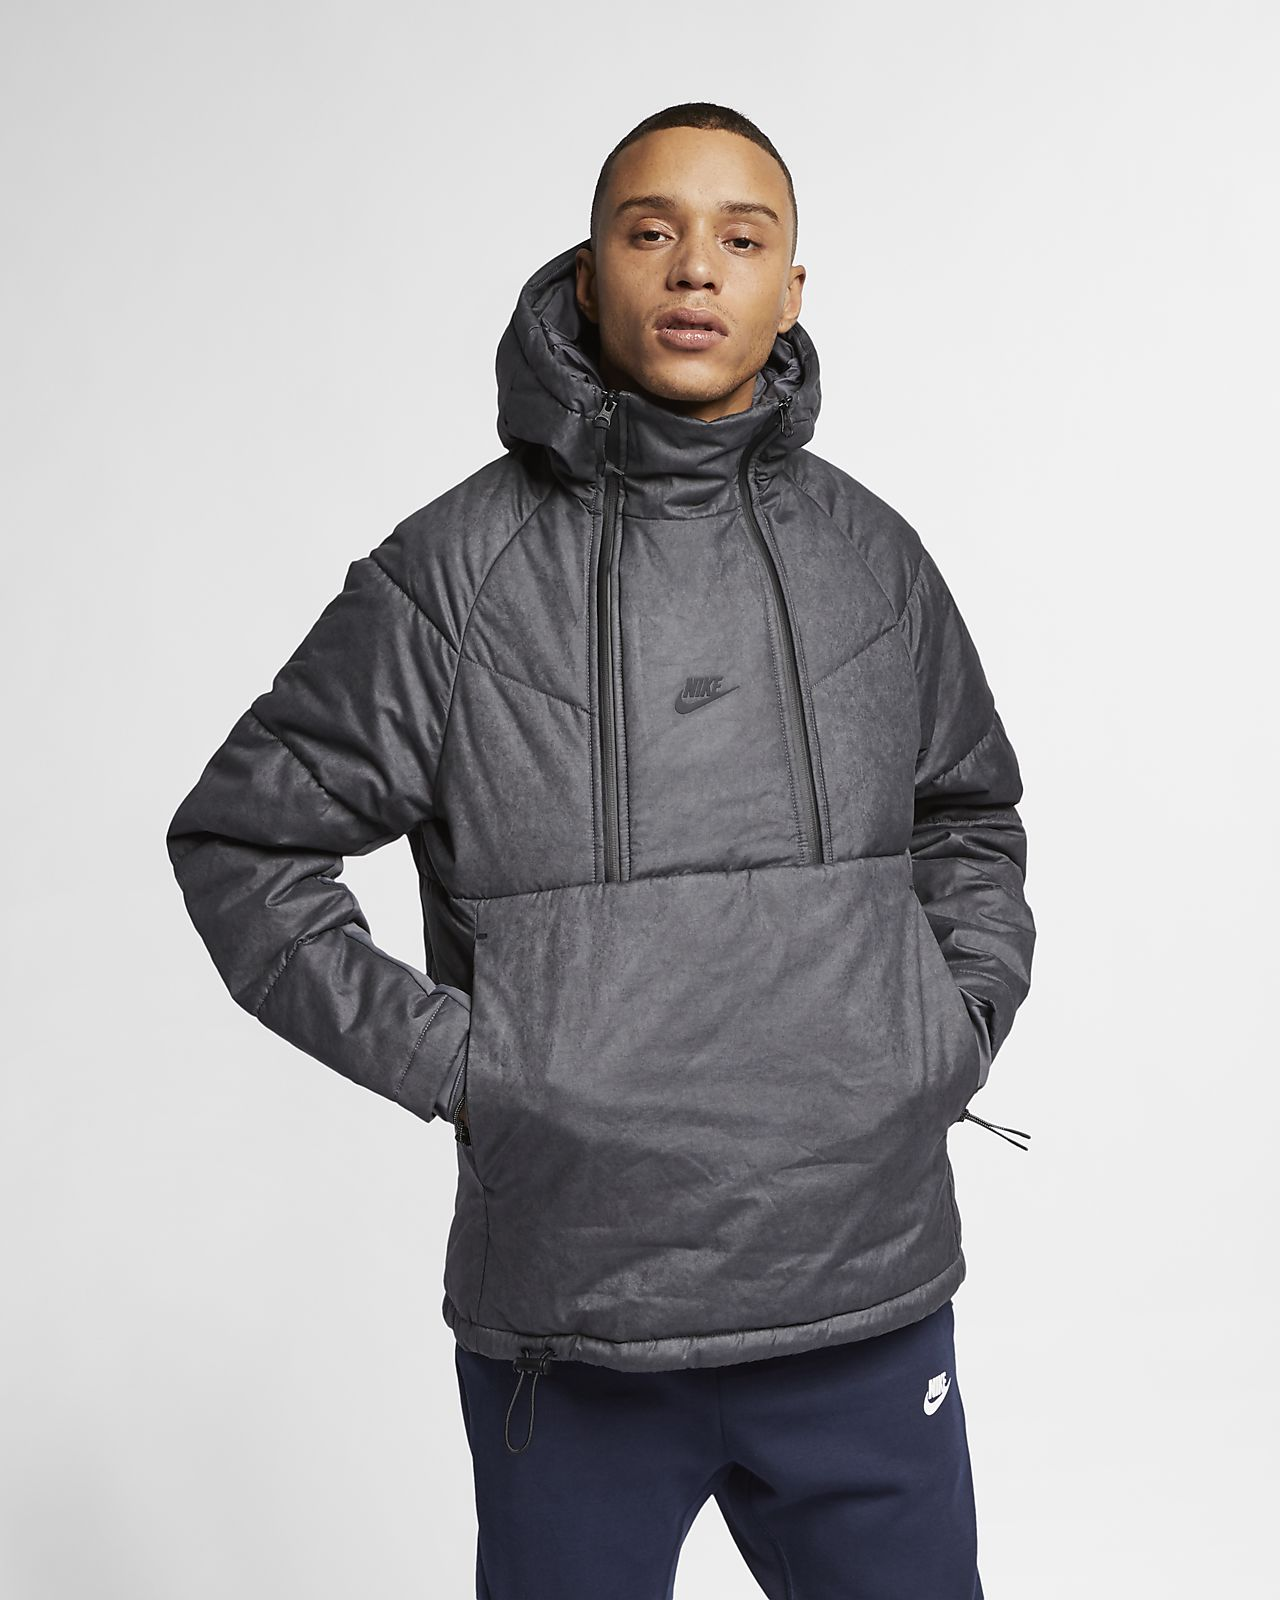 cd9c89a91acb7 Giacca con imbottitura sintetica Nike Sportswear Tech Pack - Uomo ...